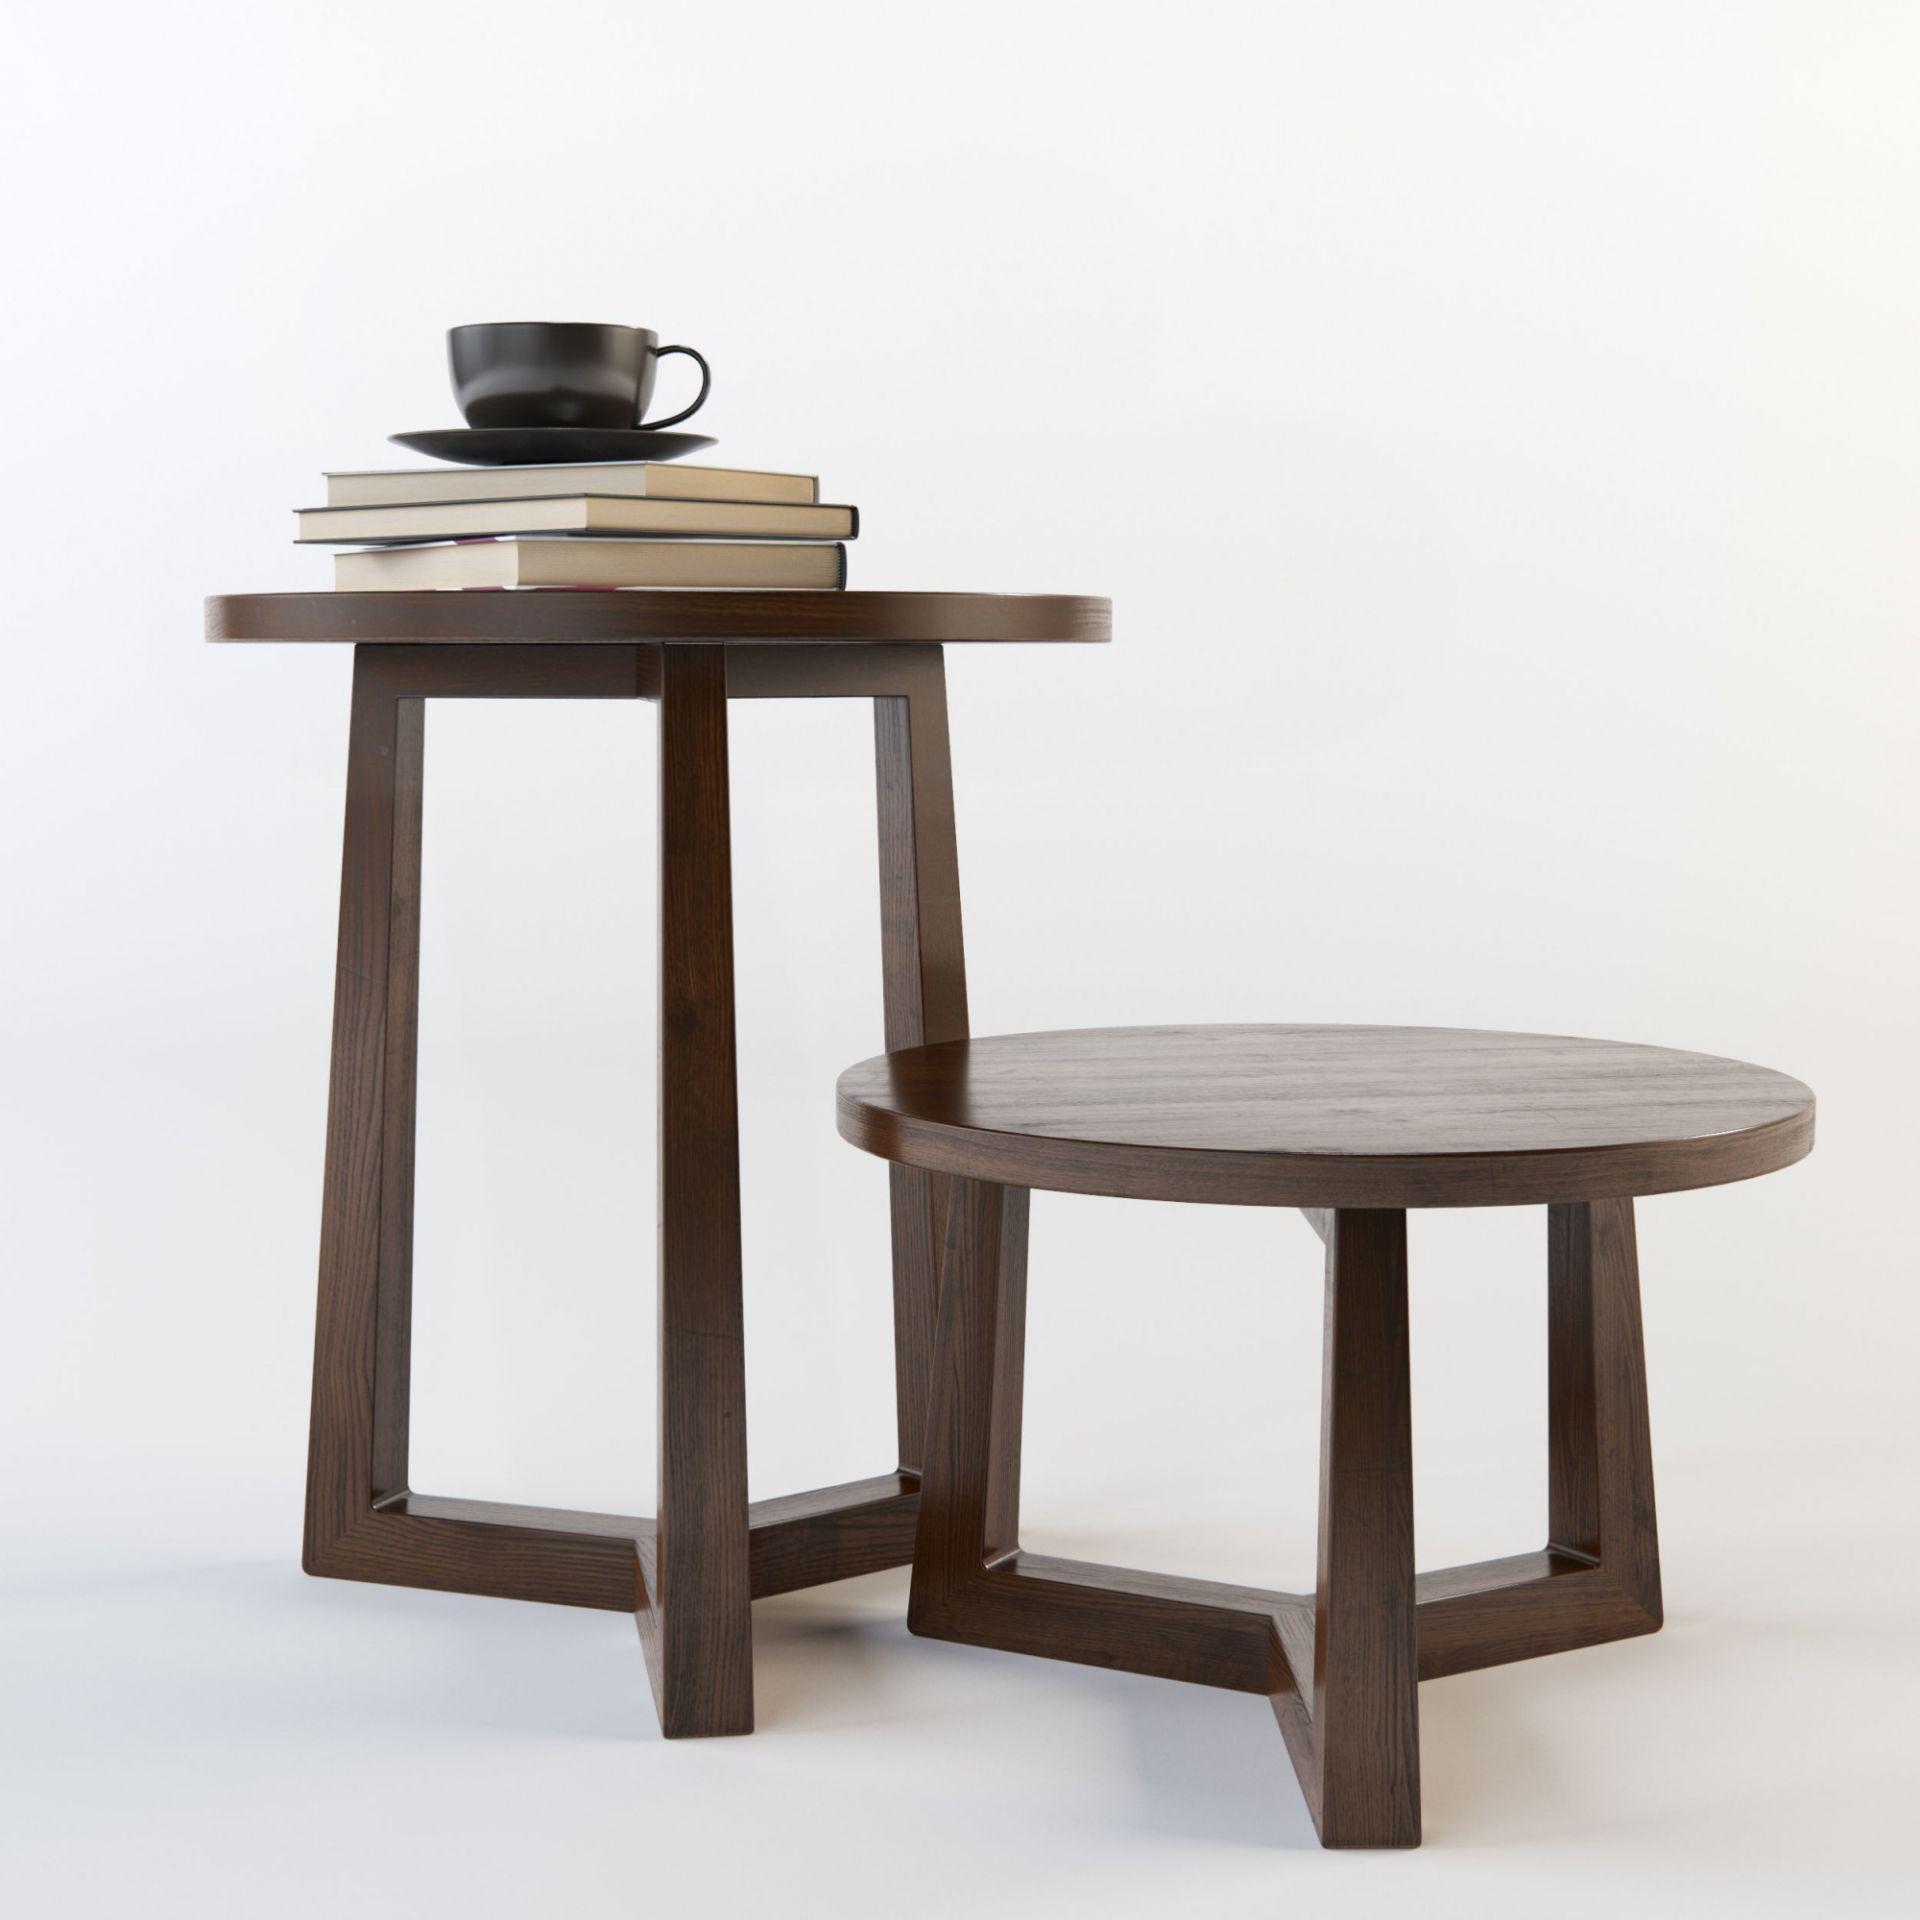 Jiff Side Table Studio Italia